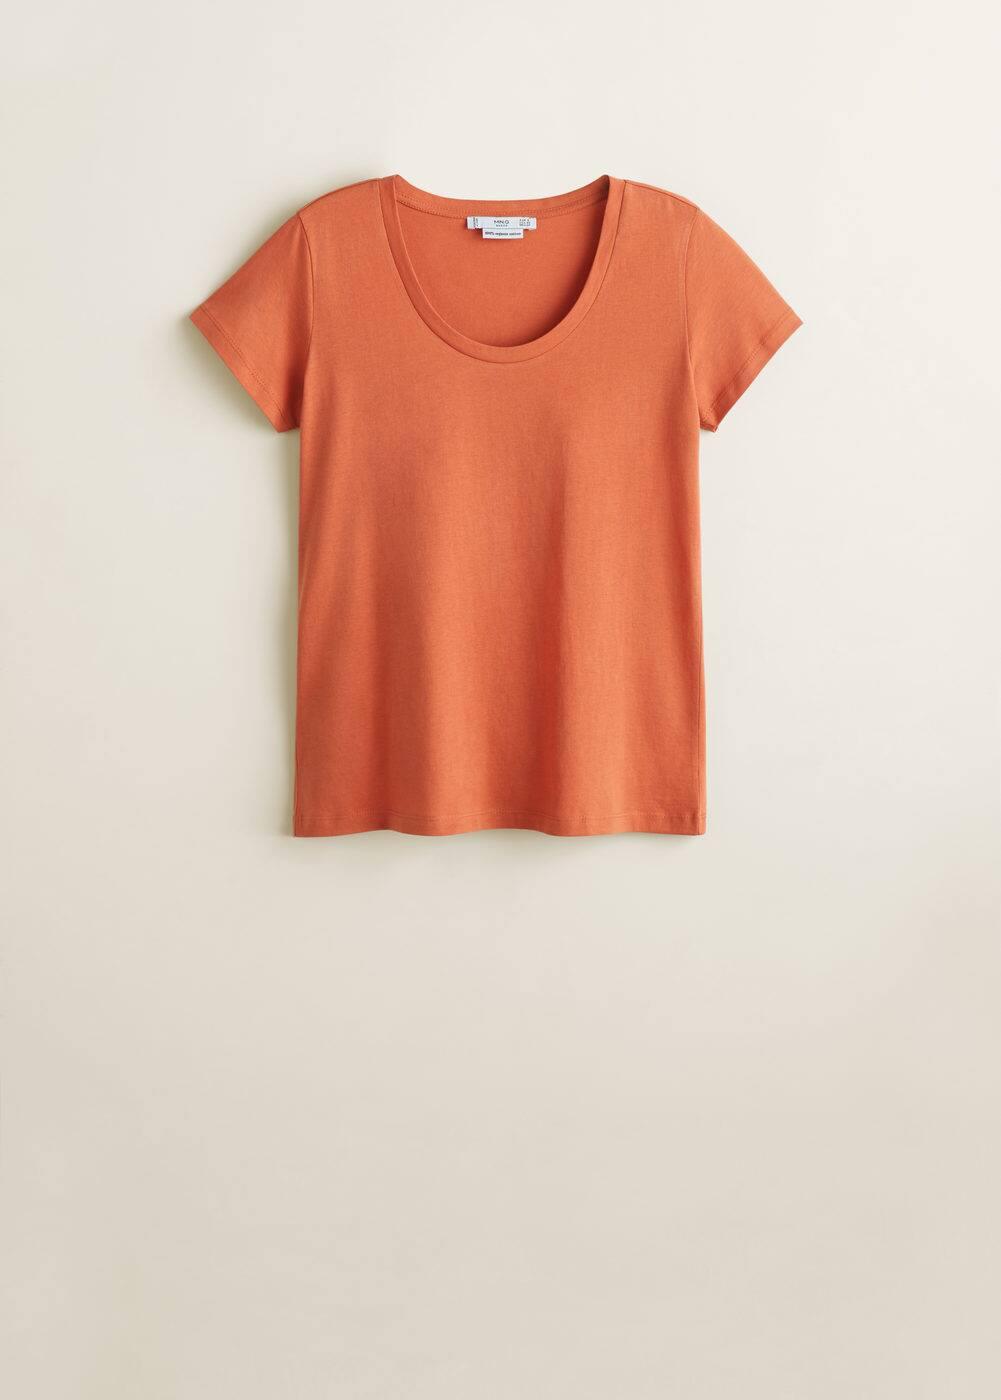 Mango - Camiseta algodón orgánico - 7